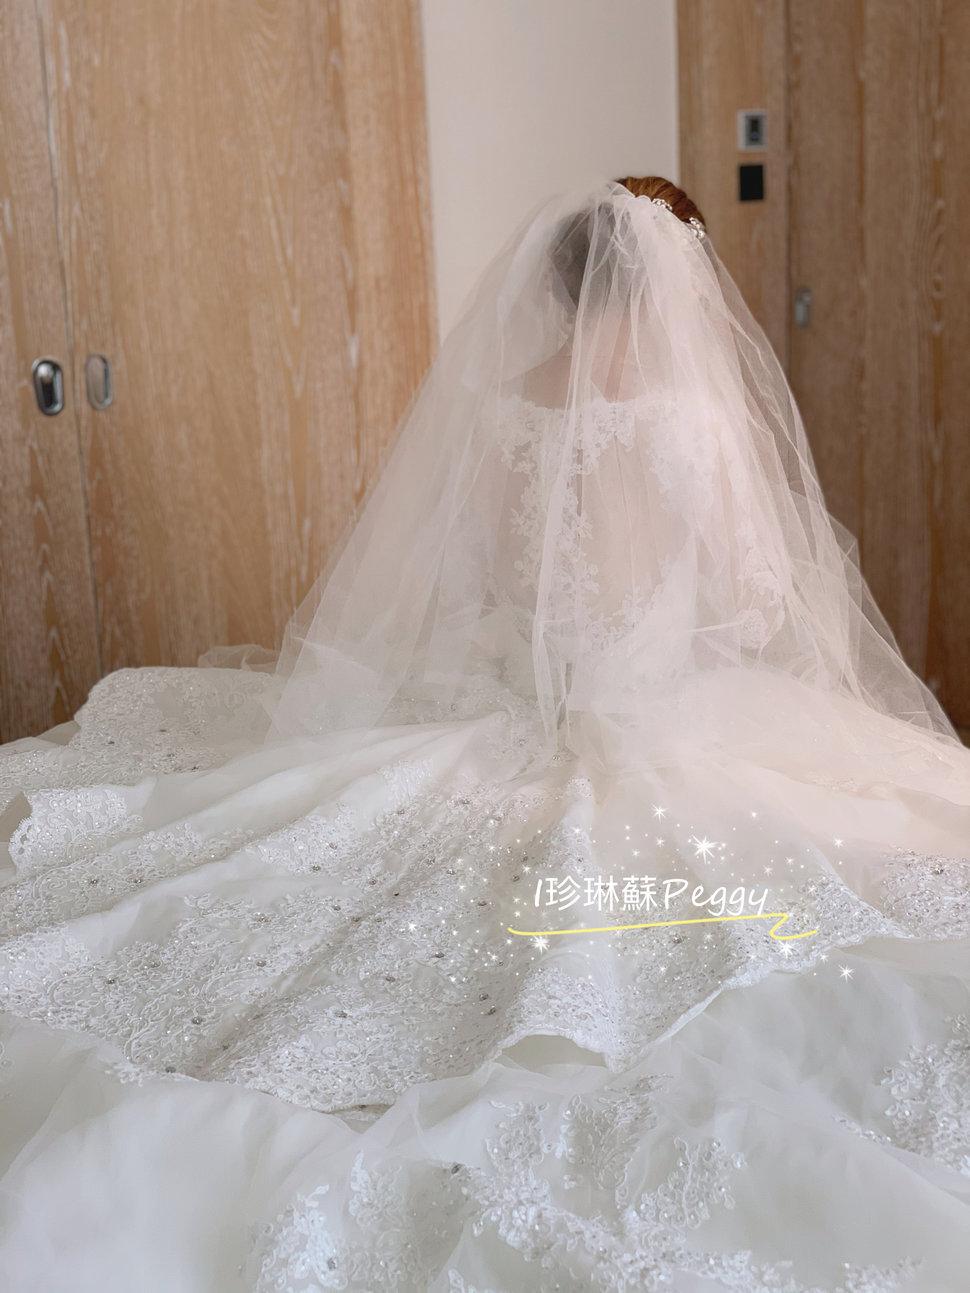 6B6238AC-312C-4556-B12B-F488A5BE7250 - 珍琳蘇peggy《結婚吧》